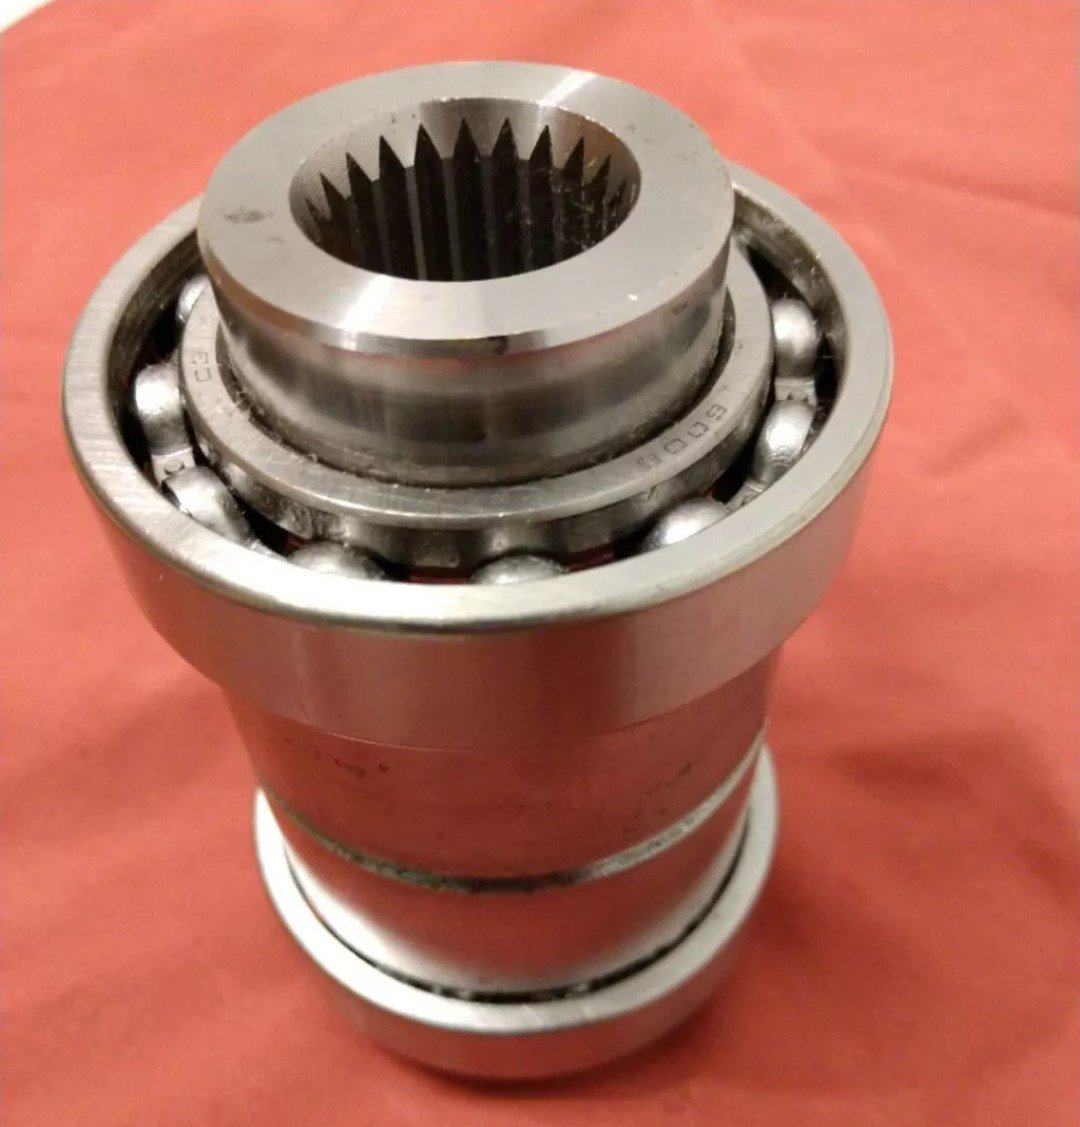 Polaris RZR 1000 front differential output hubs! - UTV Off